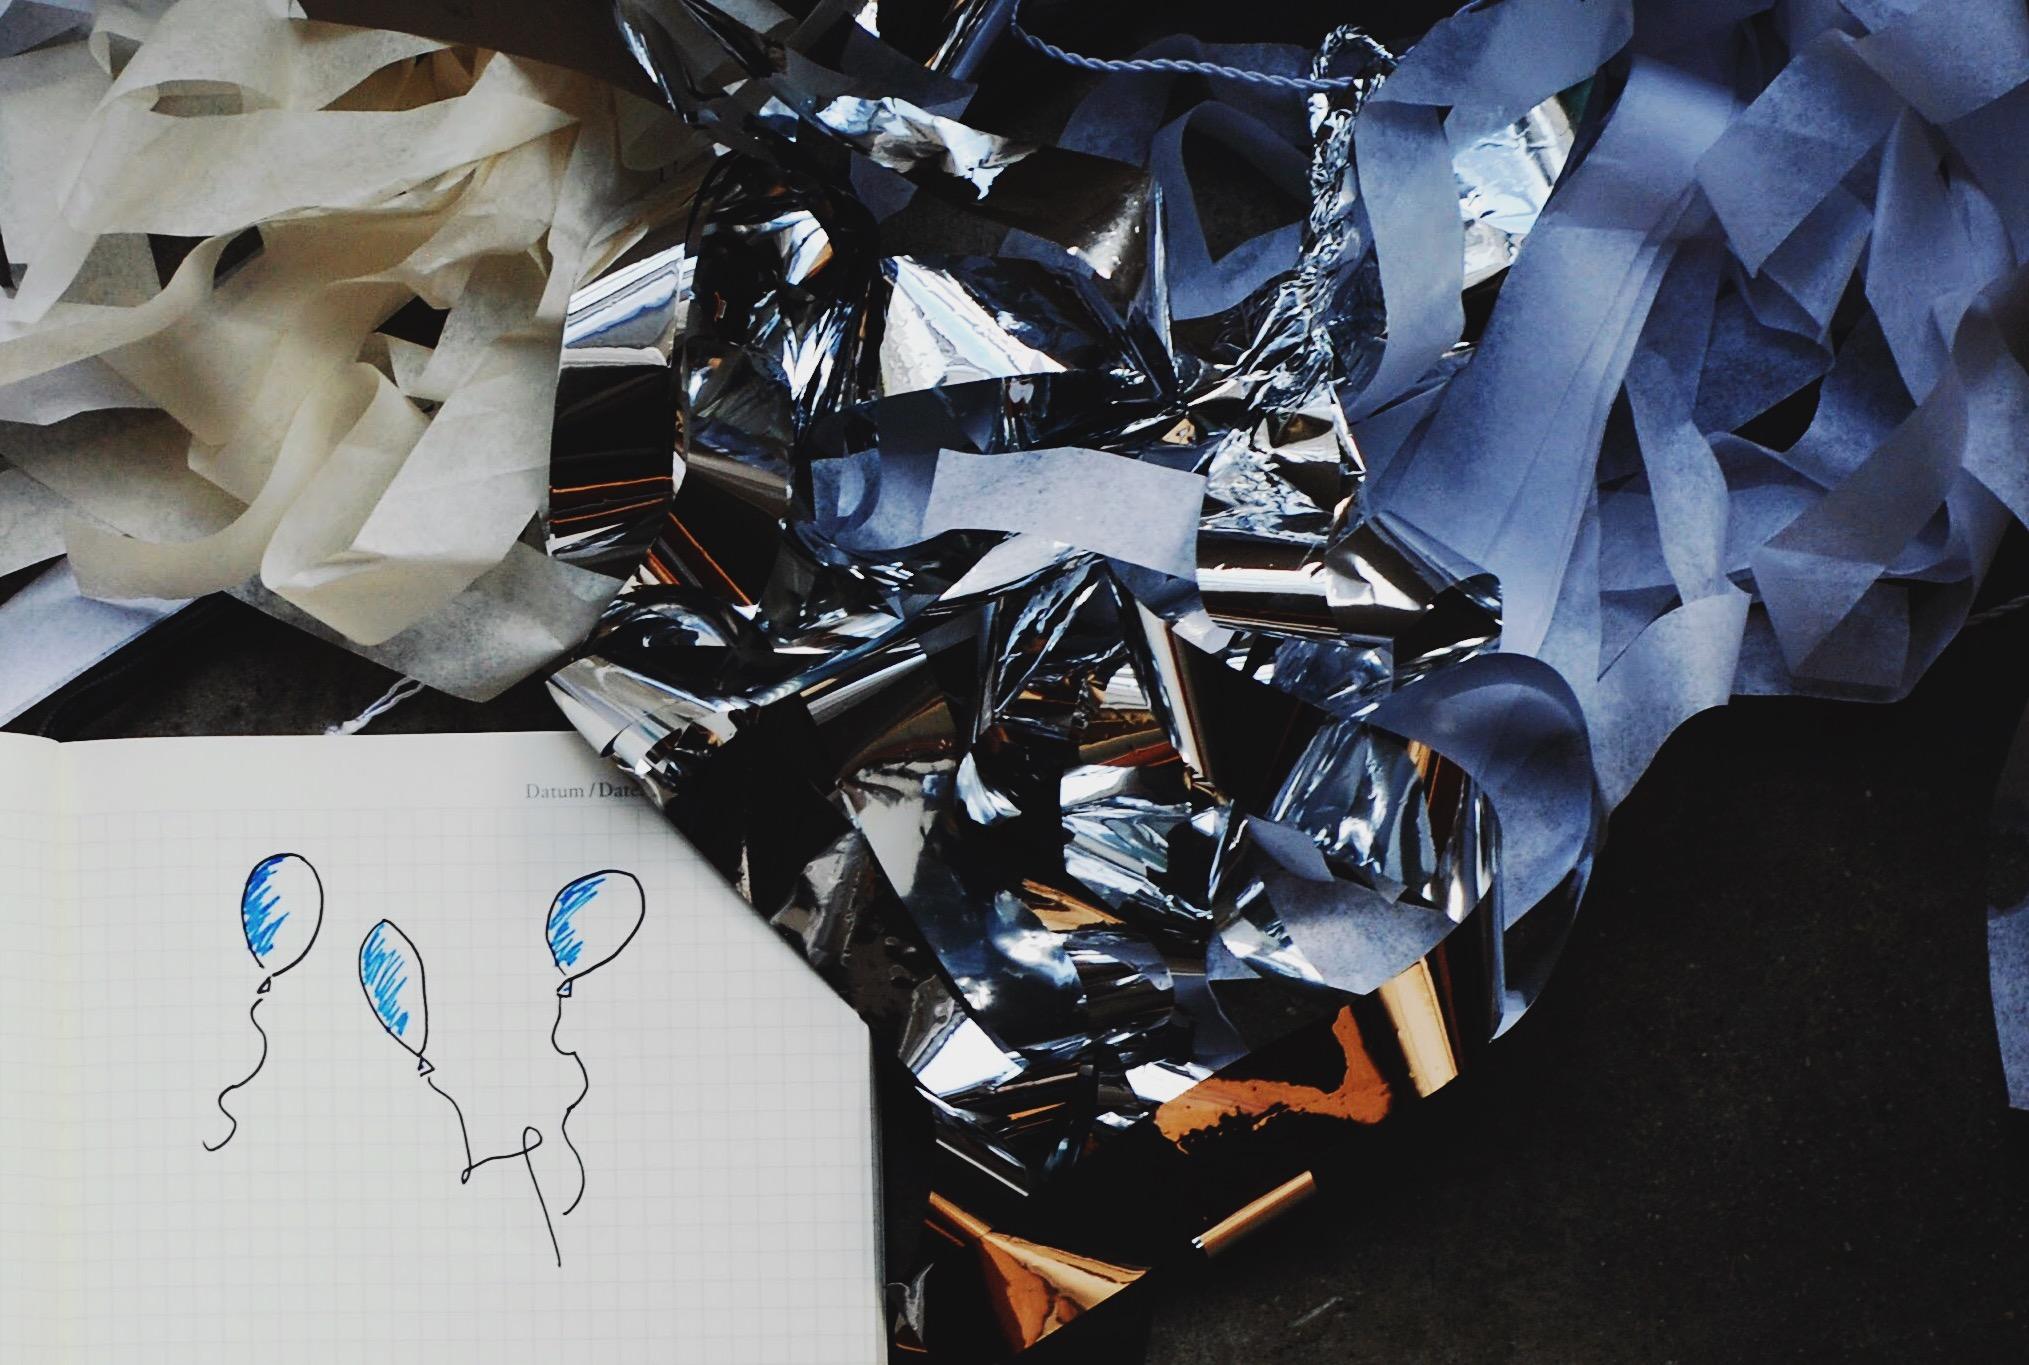 Choosing an anniversary